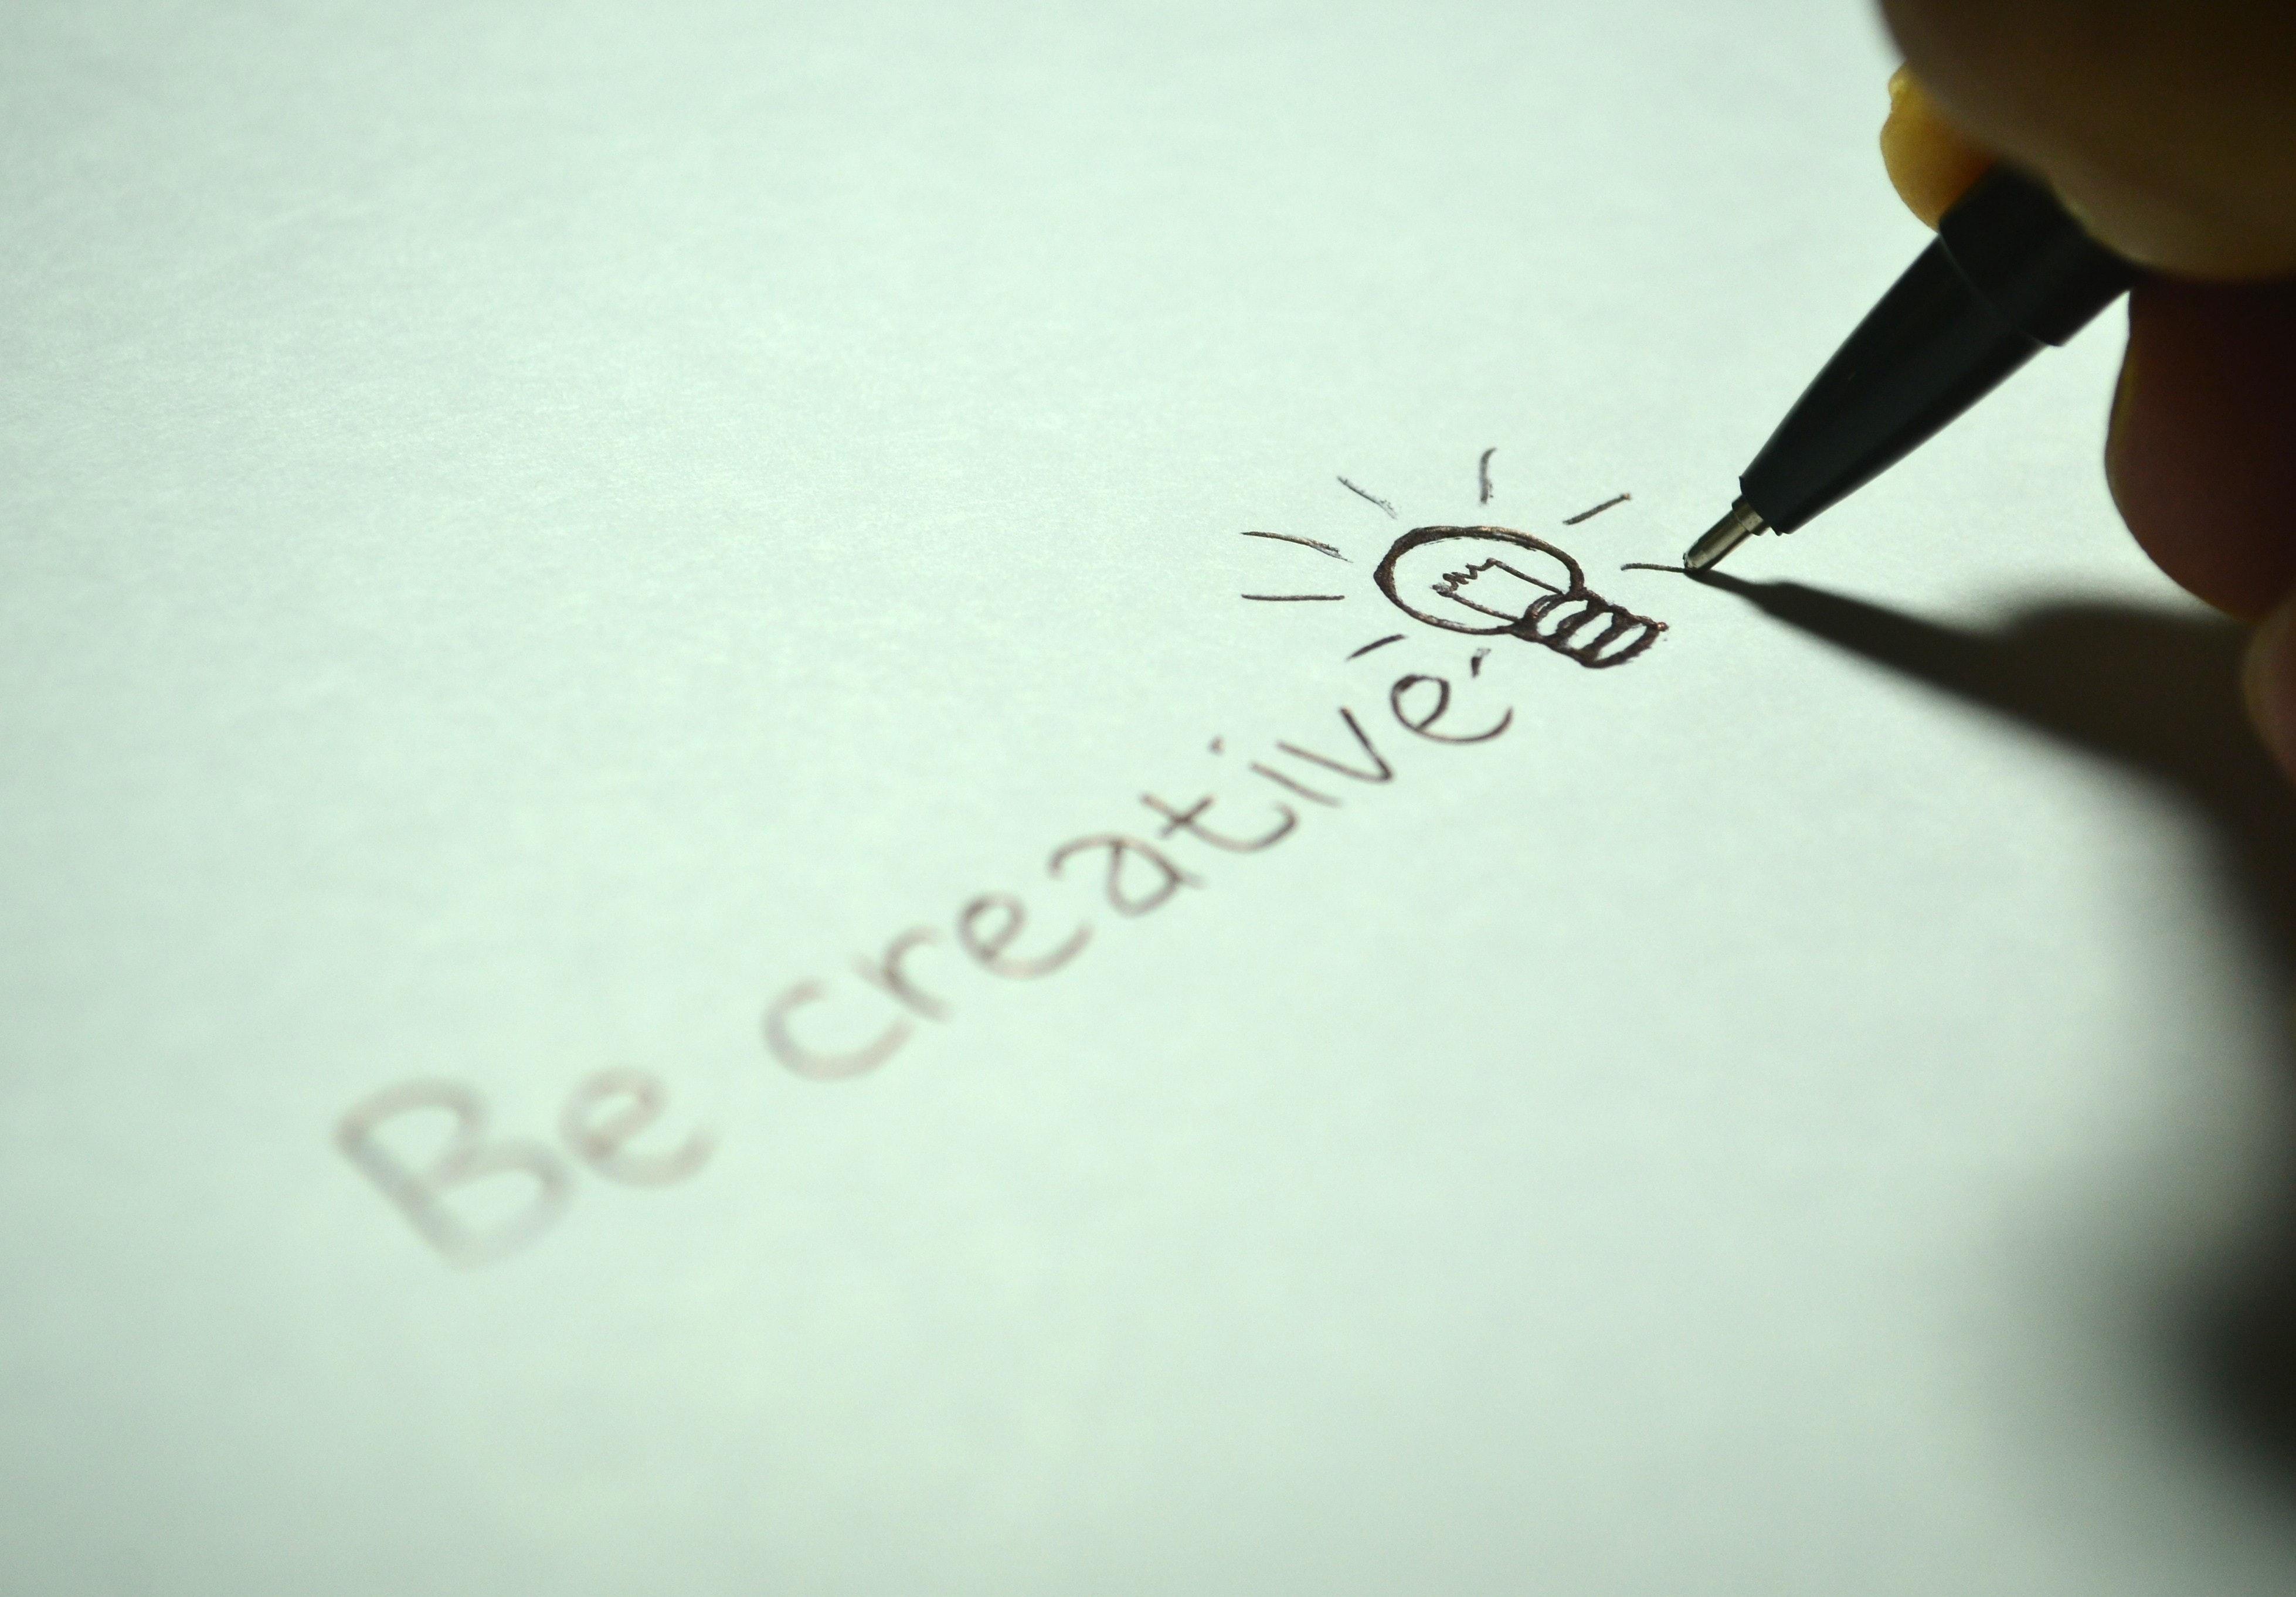 1540988947be-creative-creative-creativity-256514